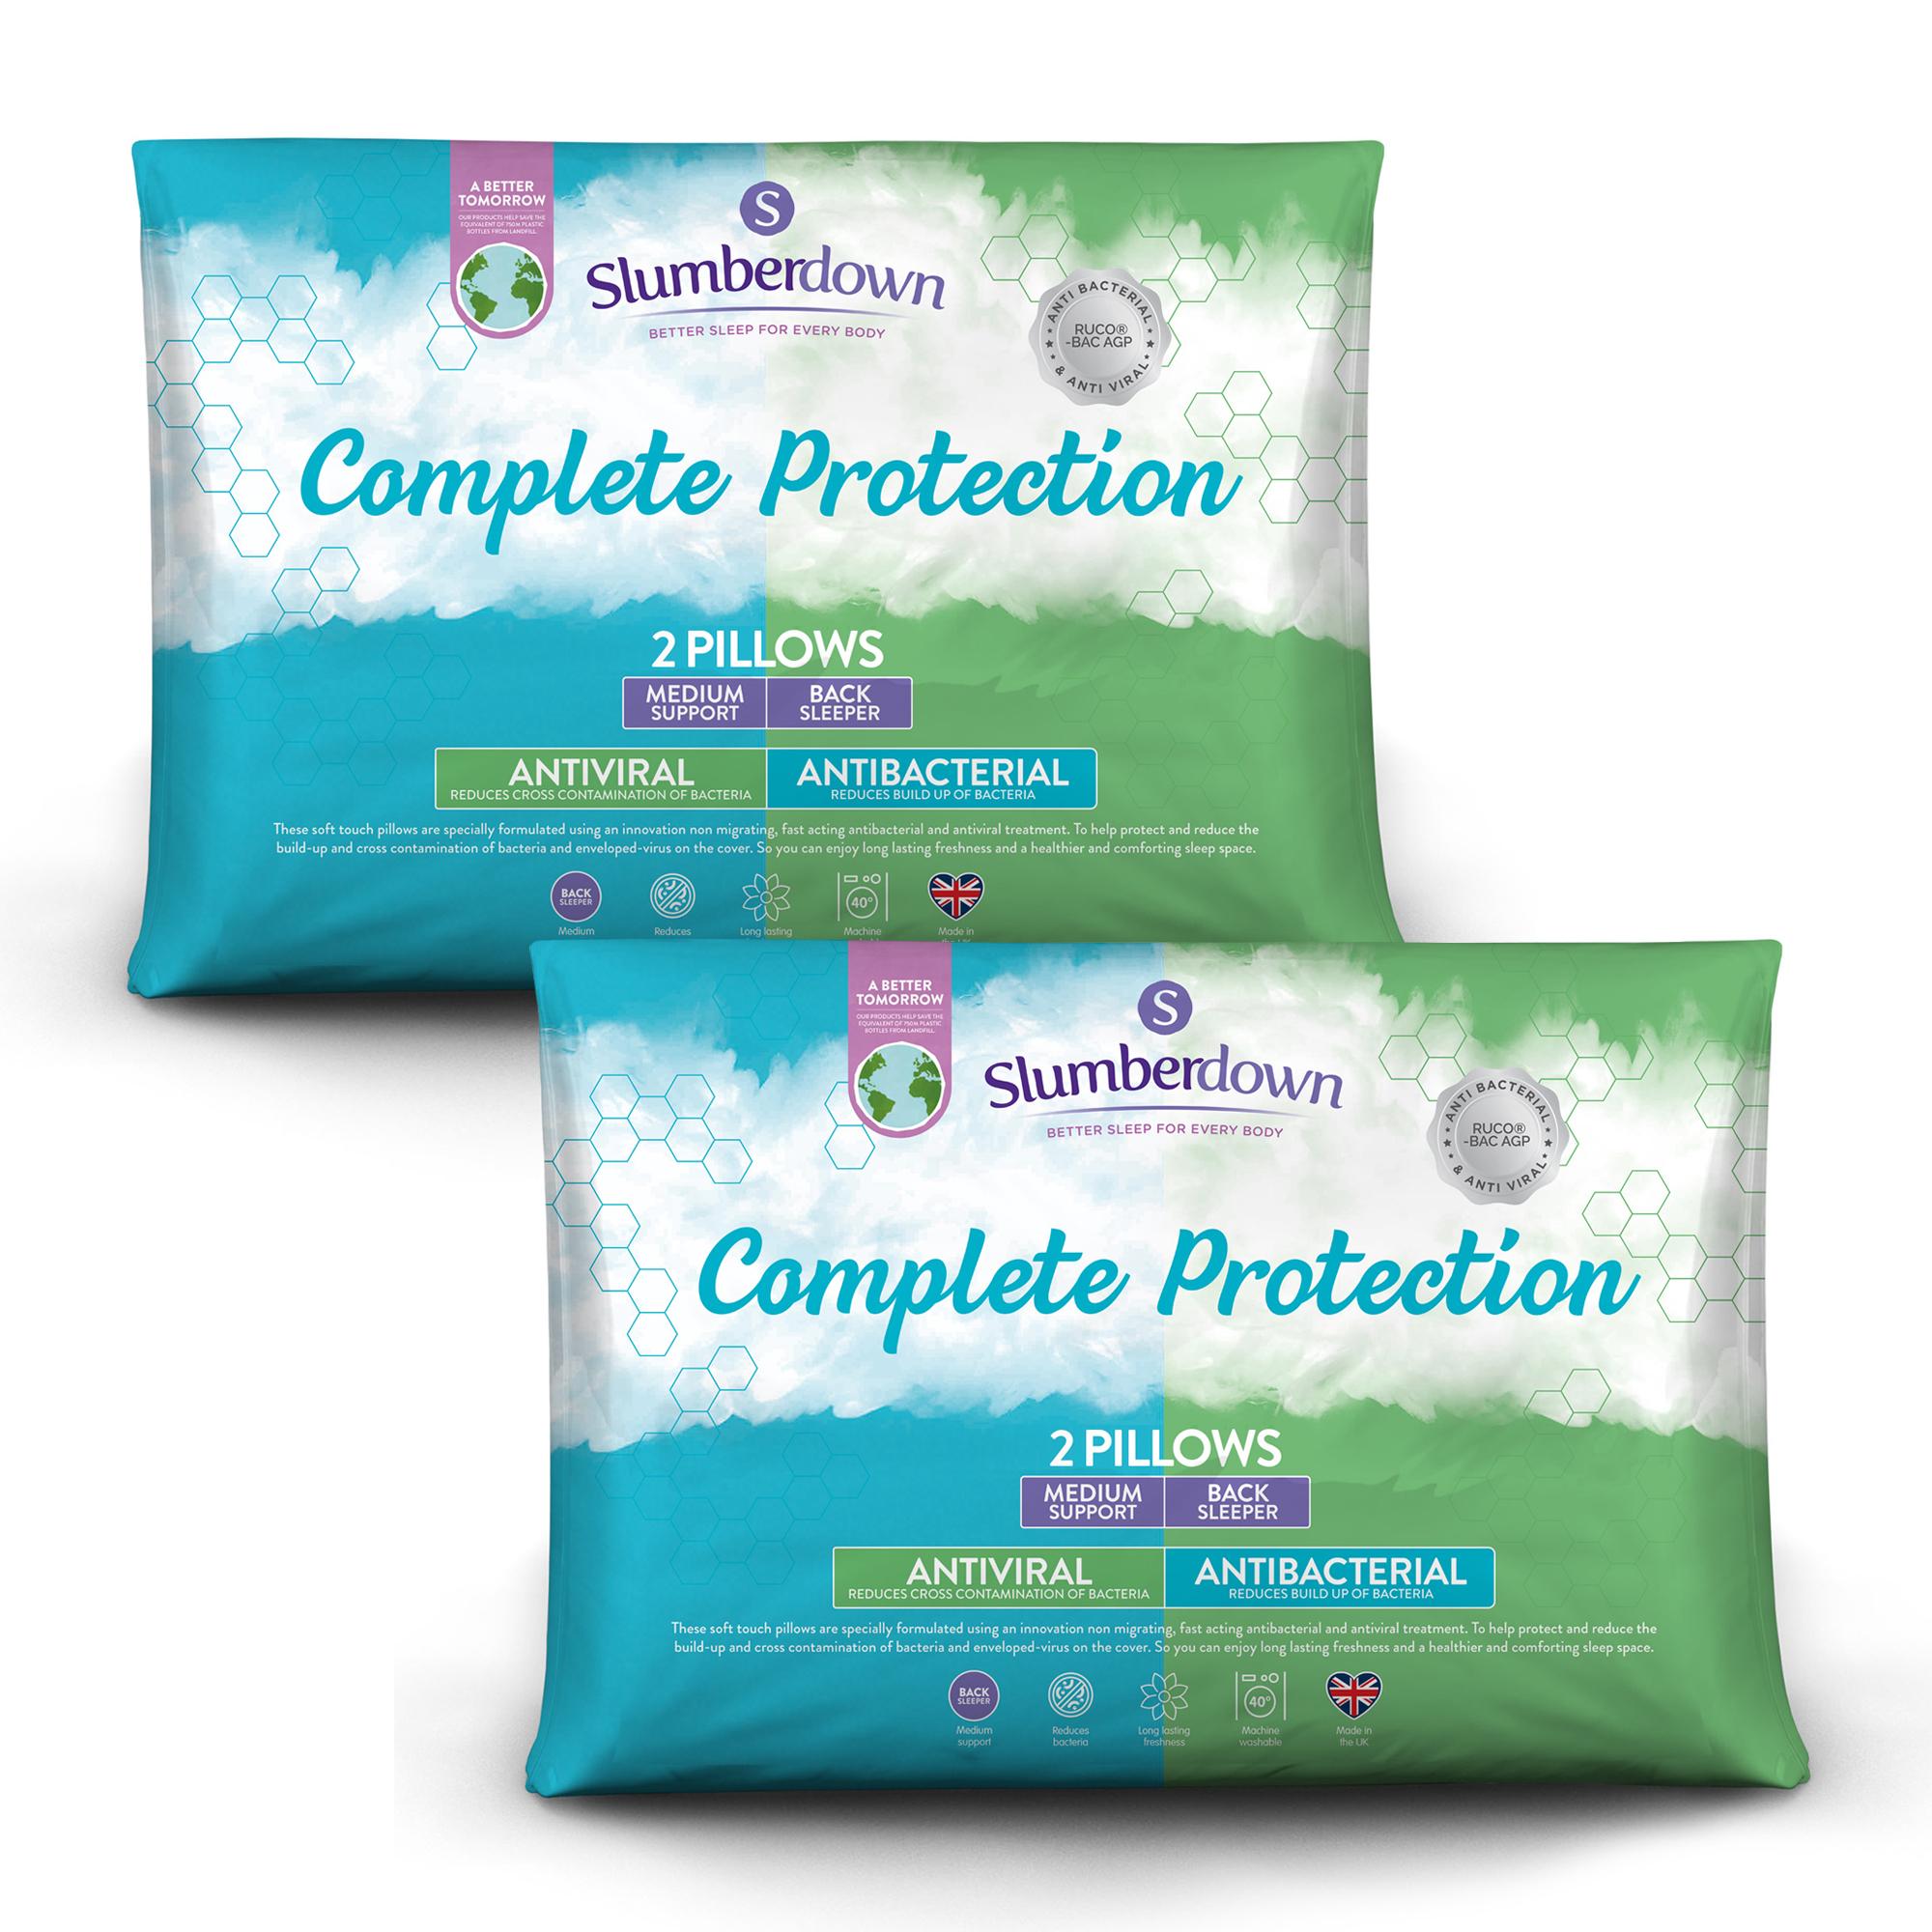 Buy One Get One Free: Slumberdown Anti-Viral / Anti-Bacterial Pillow Pair (4 Pillows Total) £16.79 Delivered @ Sleepseeker